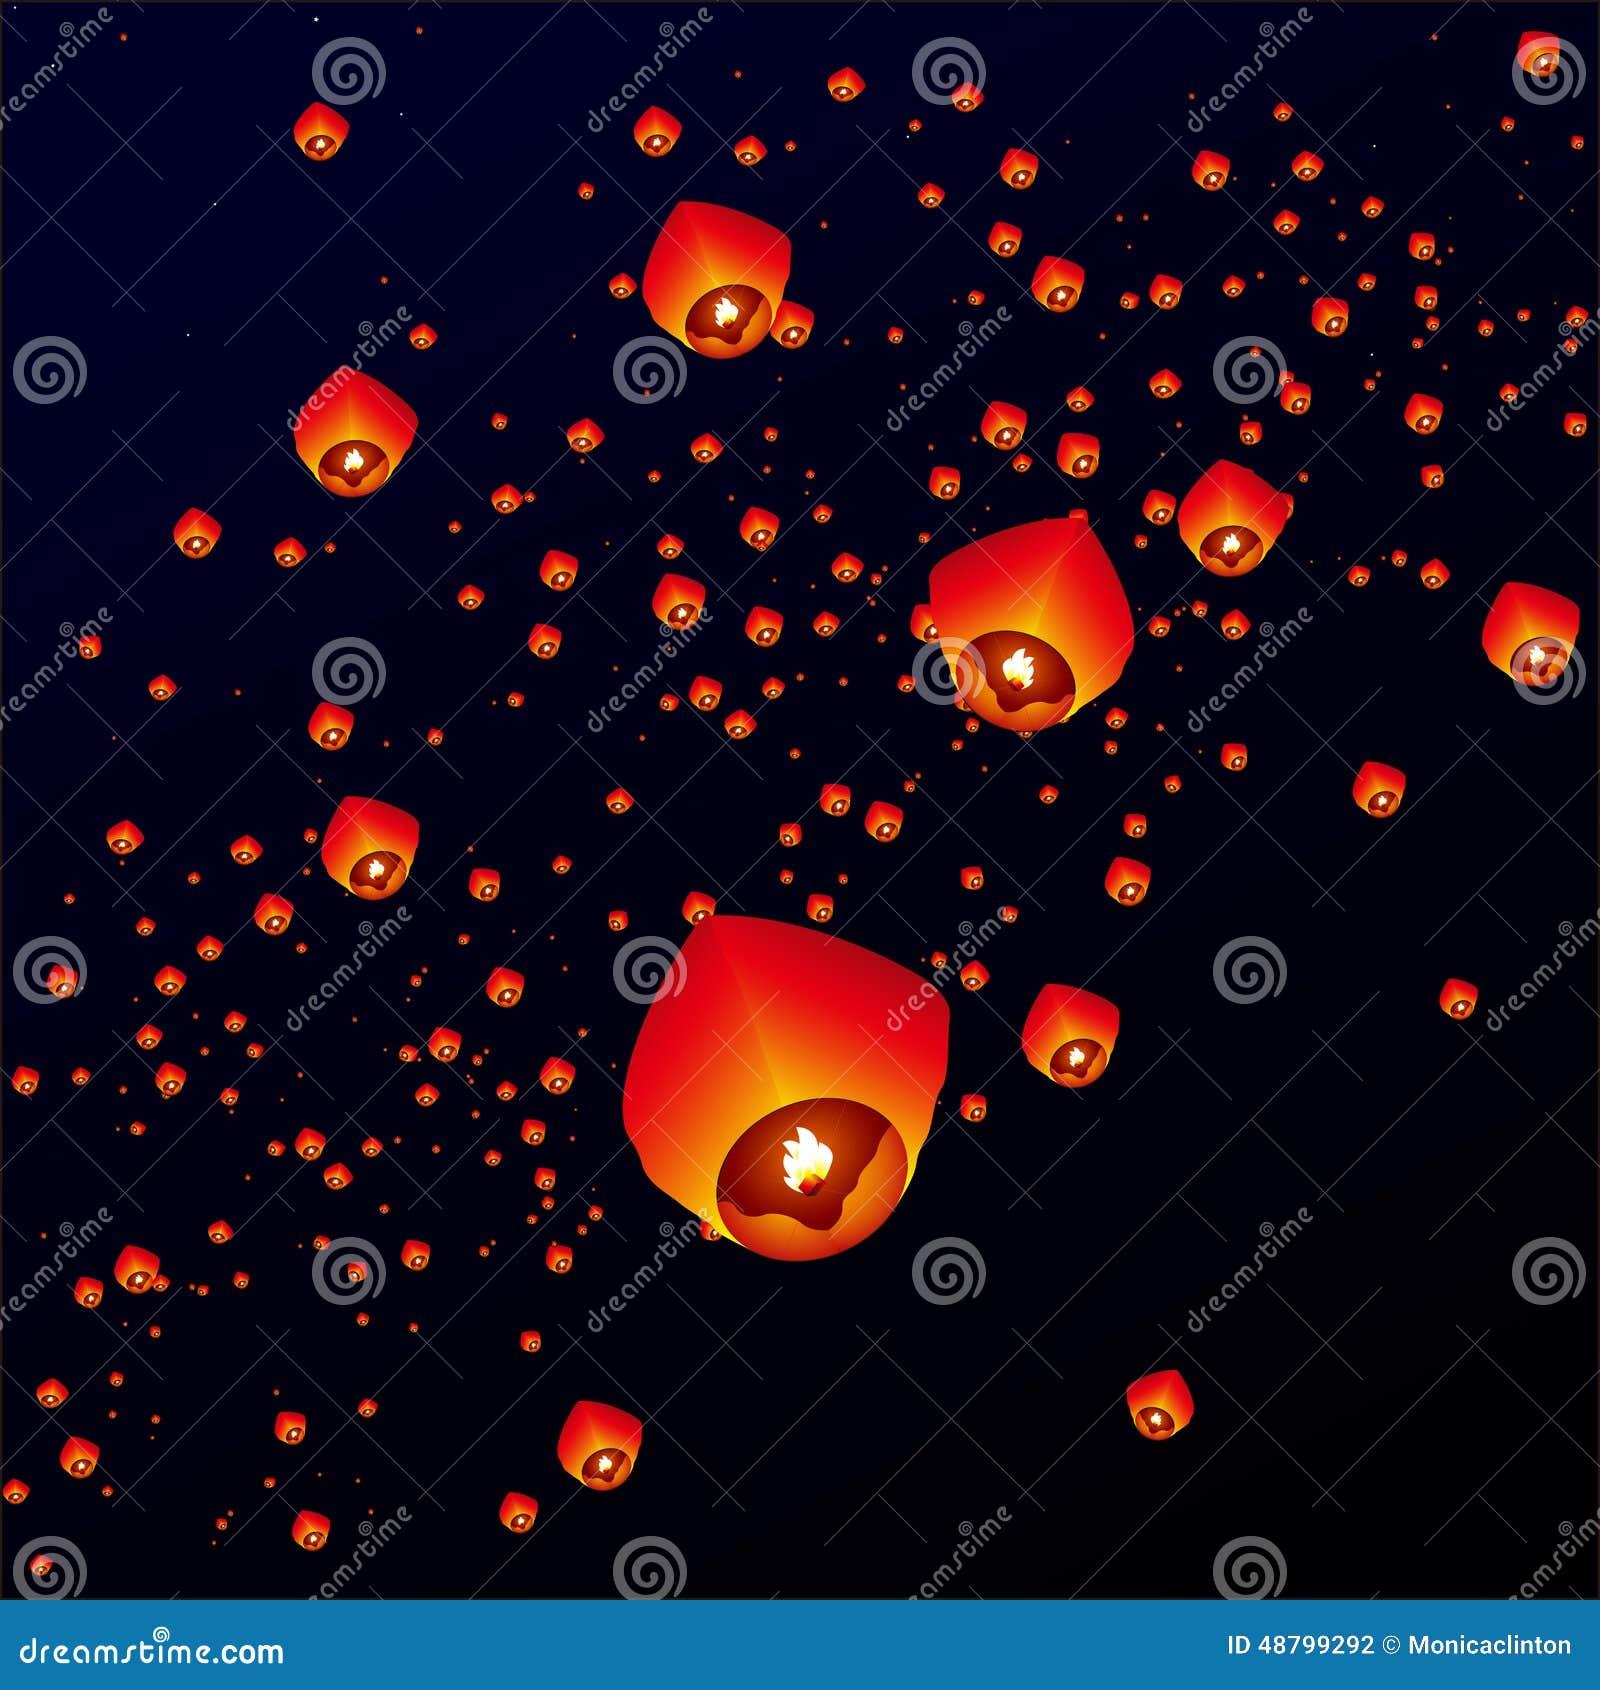 Sky Lanterns, Flying Lanterns Stock Illustration - Illustration of ... for Sky Lanterns Over Water  103wja